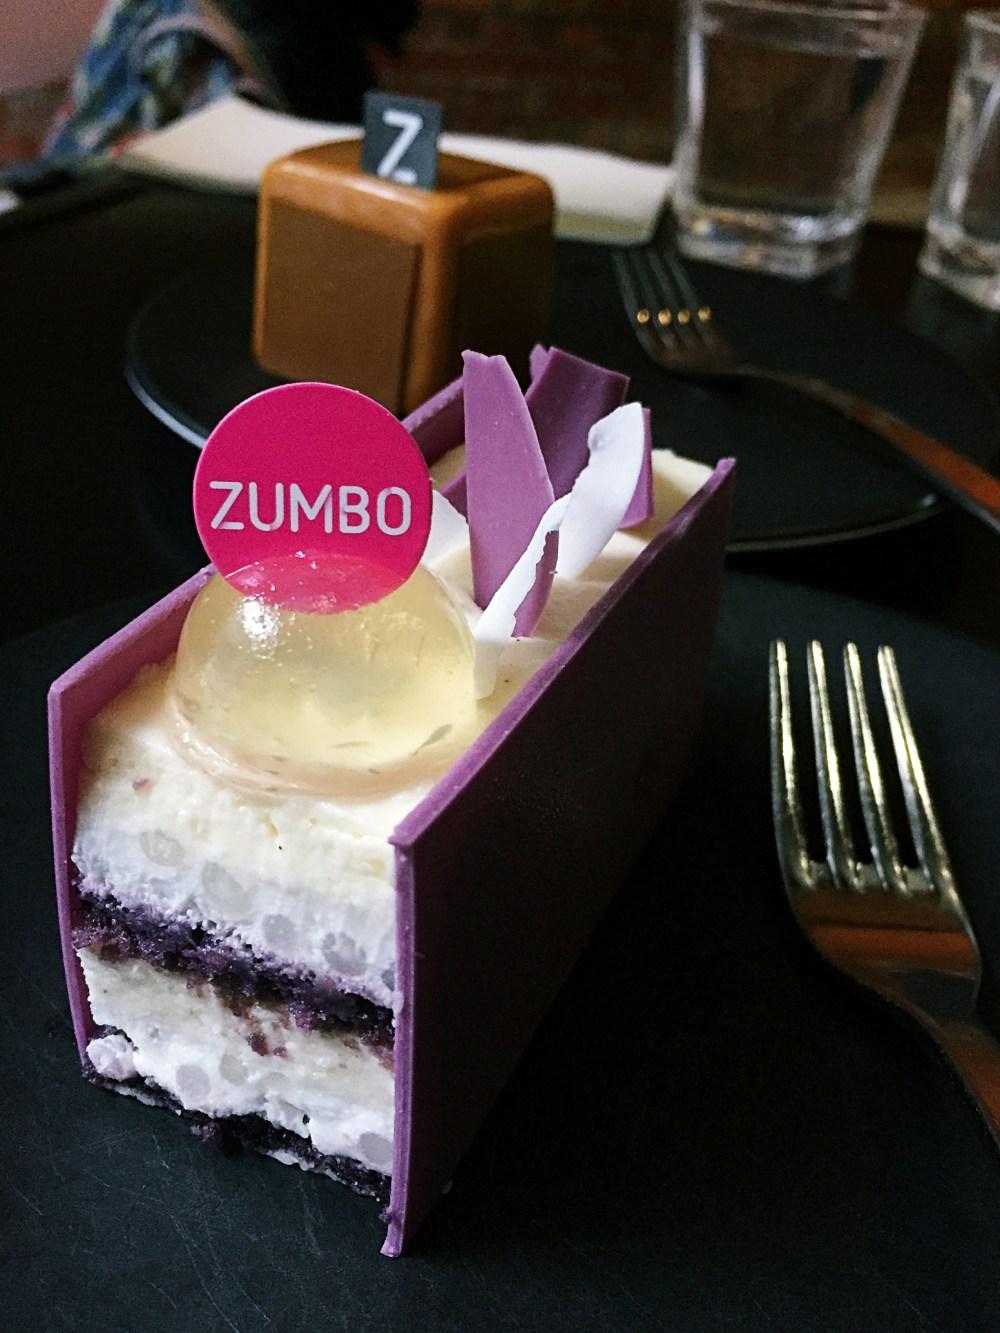 7 July 2016: Zumbo Patisserie | Melbourne, Australia